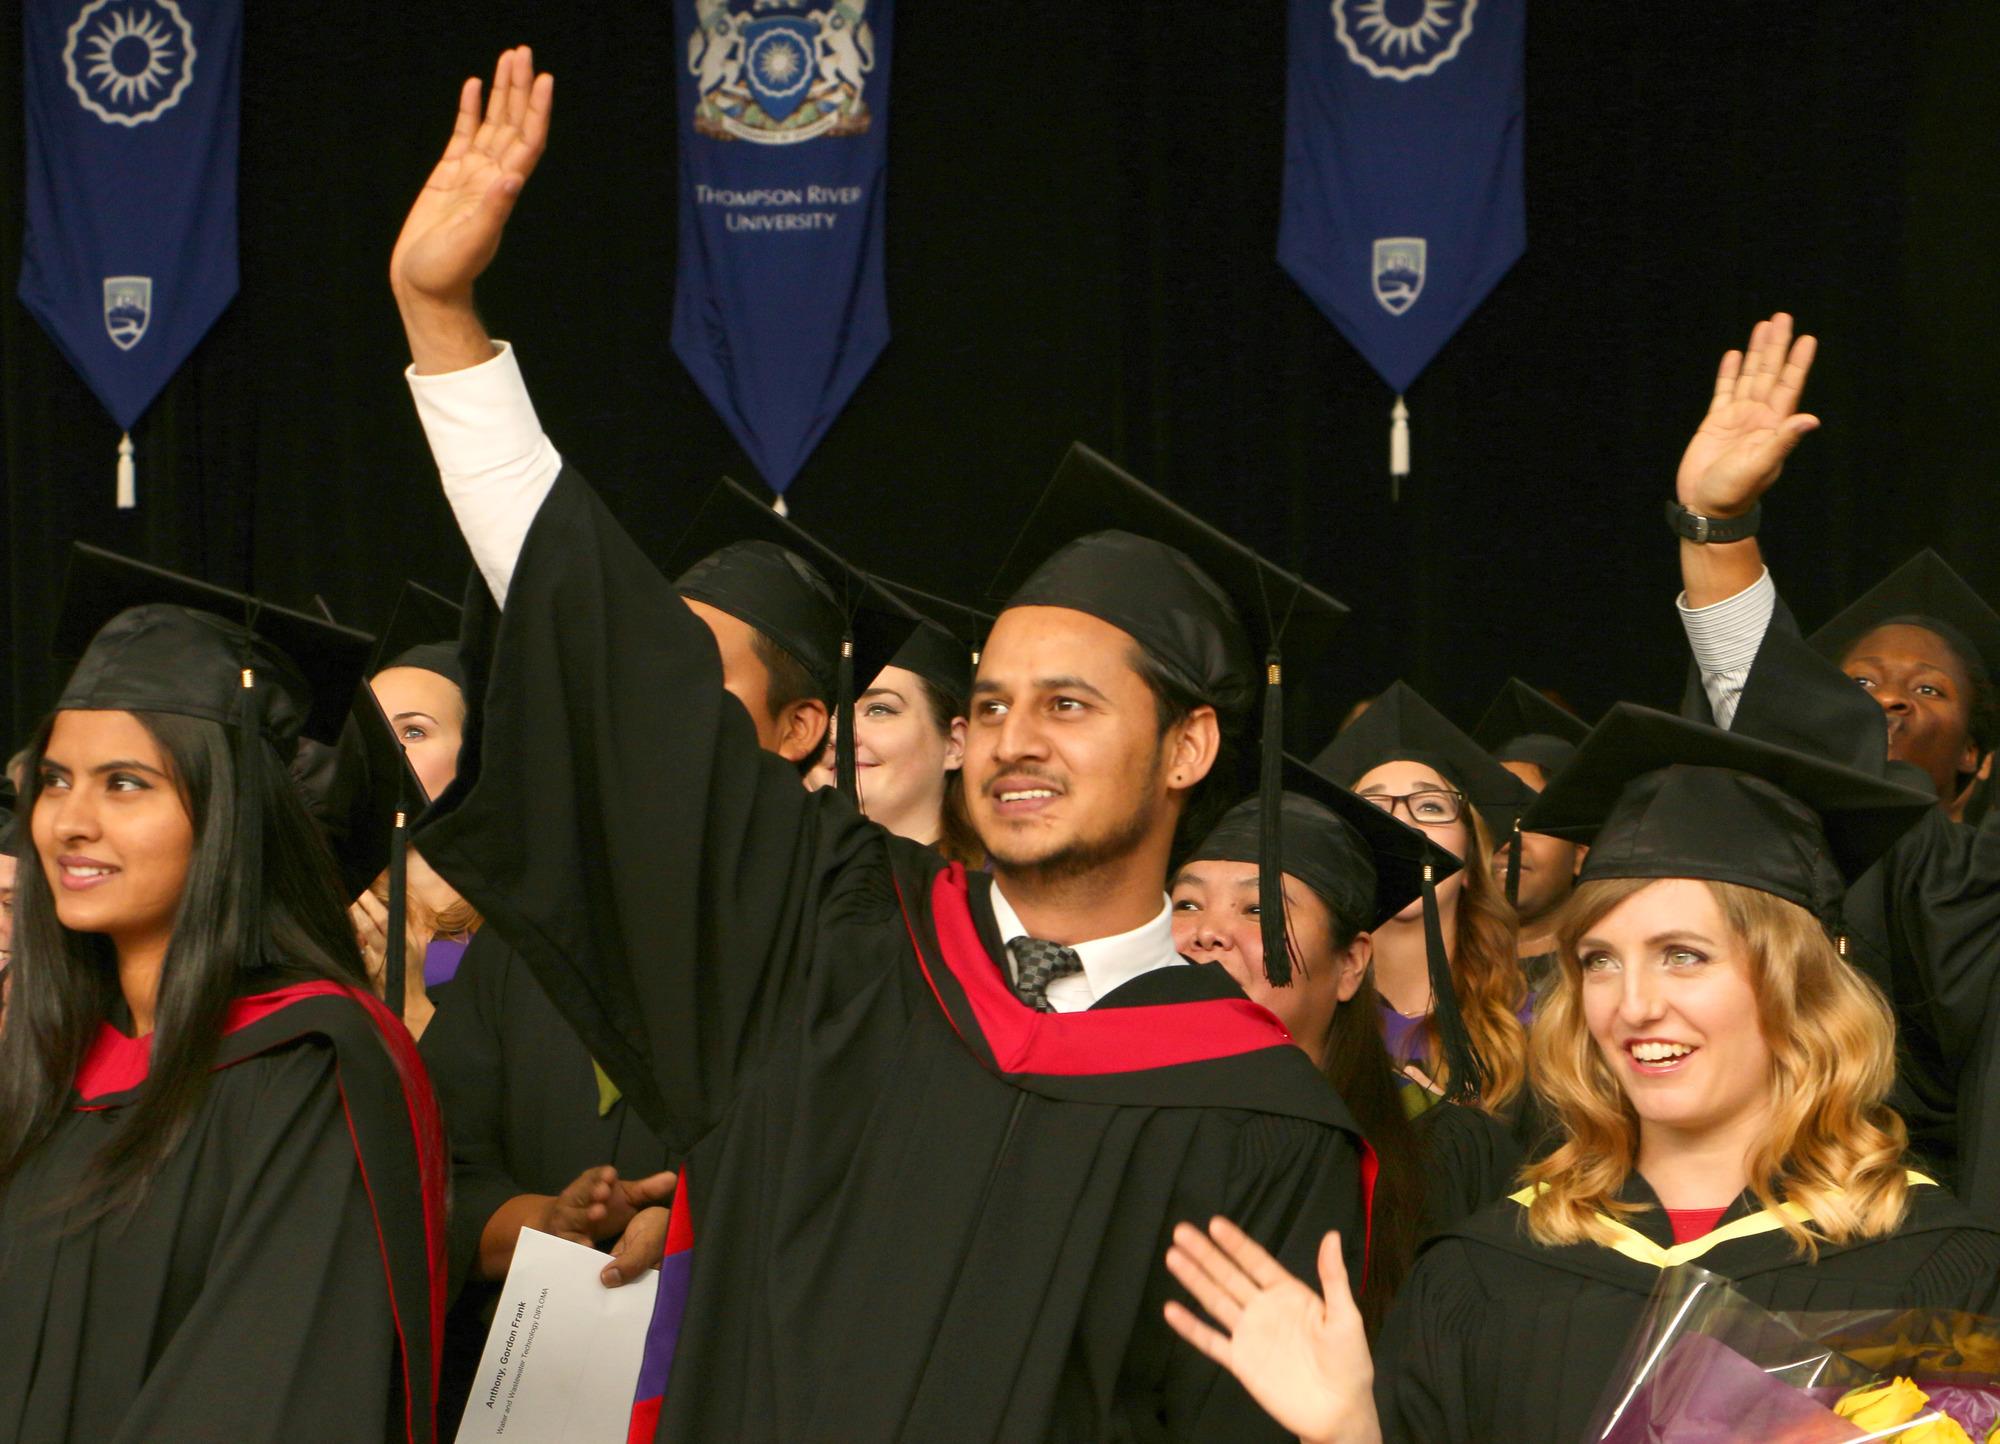 Thompson-Rivers-University-Graduation-July2020